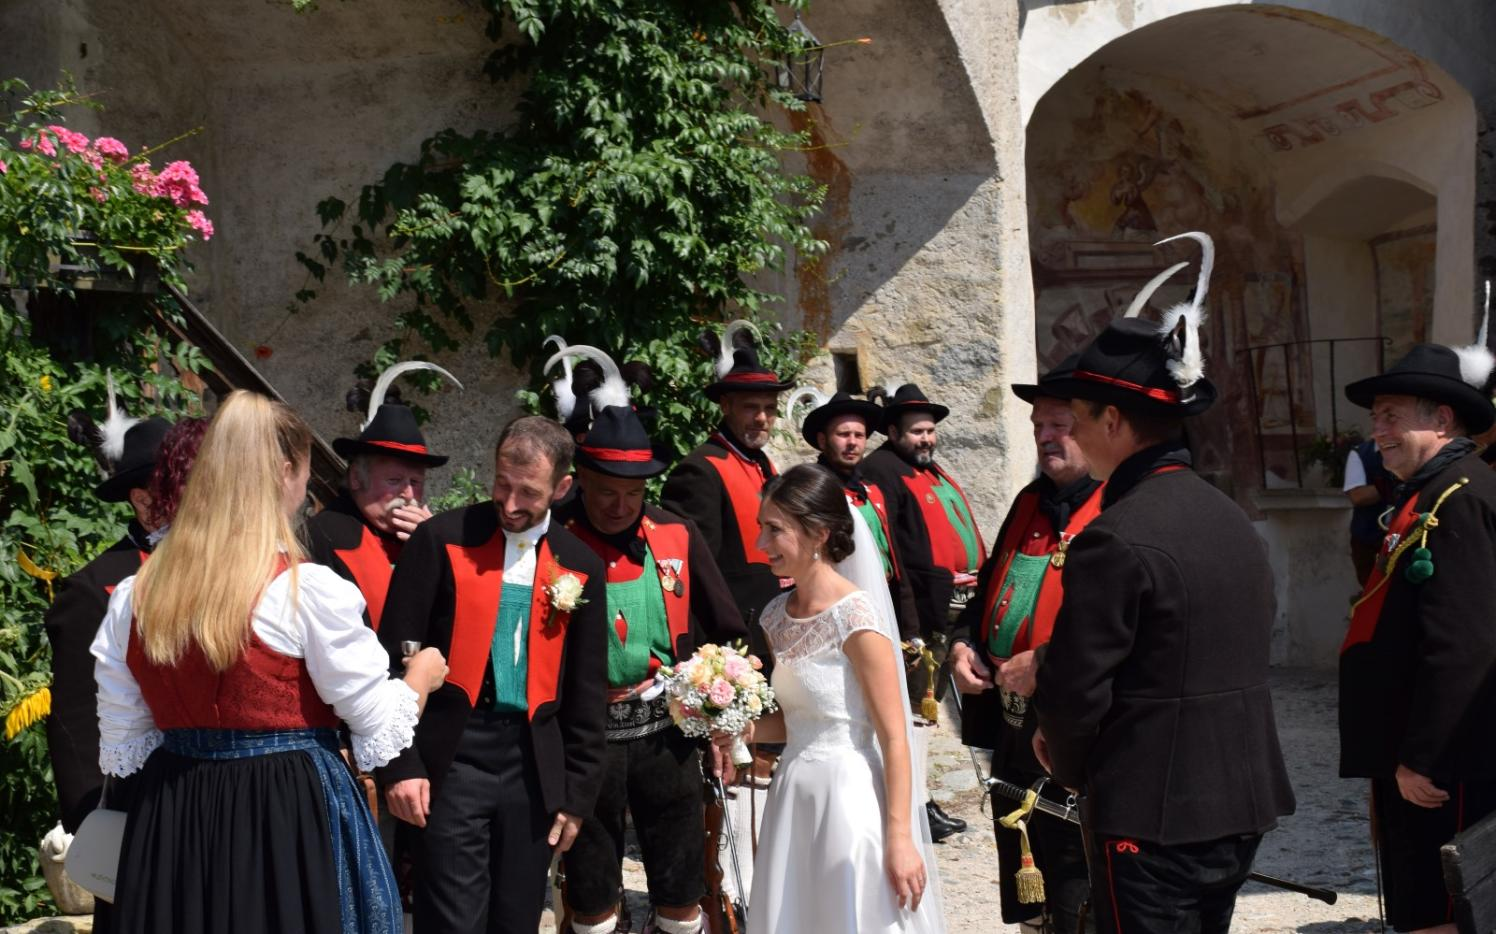 2021_Lana_Hochzeit SK Lana Hptm. Pixner (3)